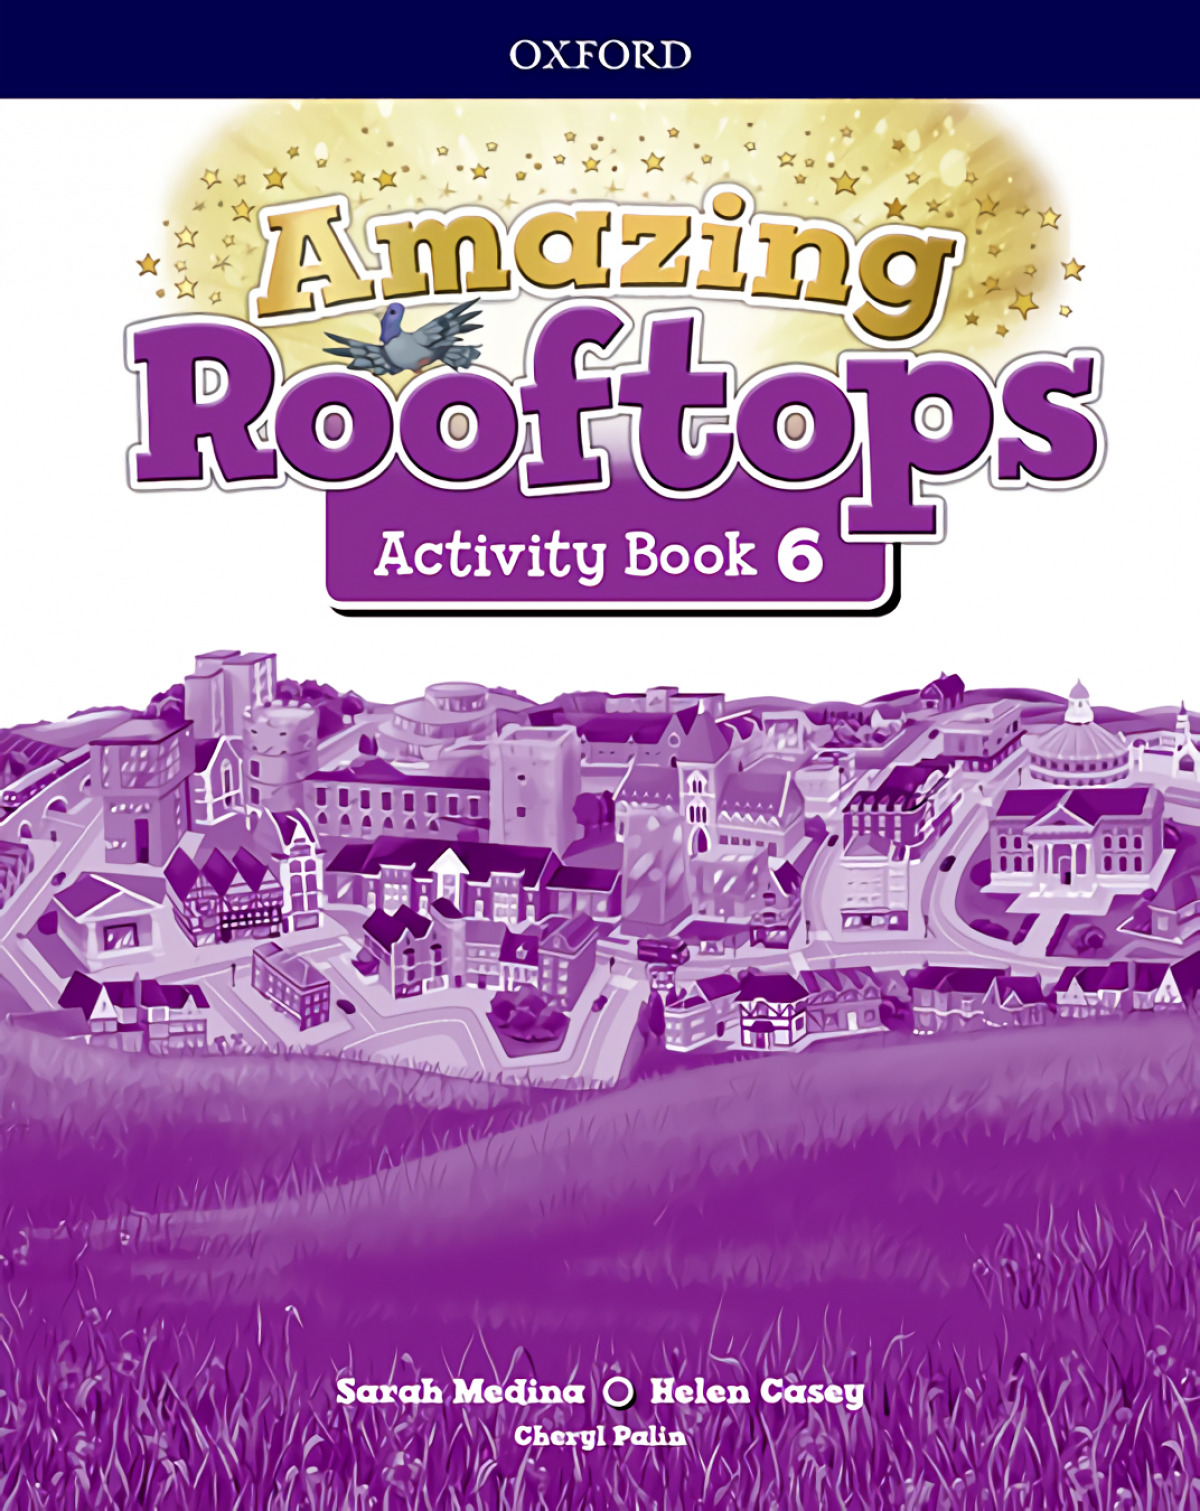 AMAZING ROOFTOPS 6 PRIMARY ACTIVITY BOOK 9780194168427